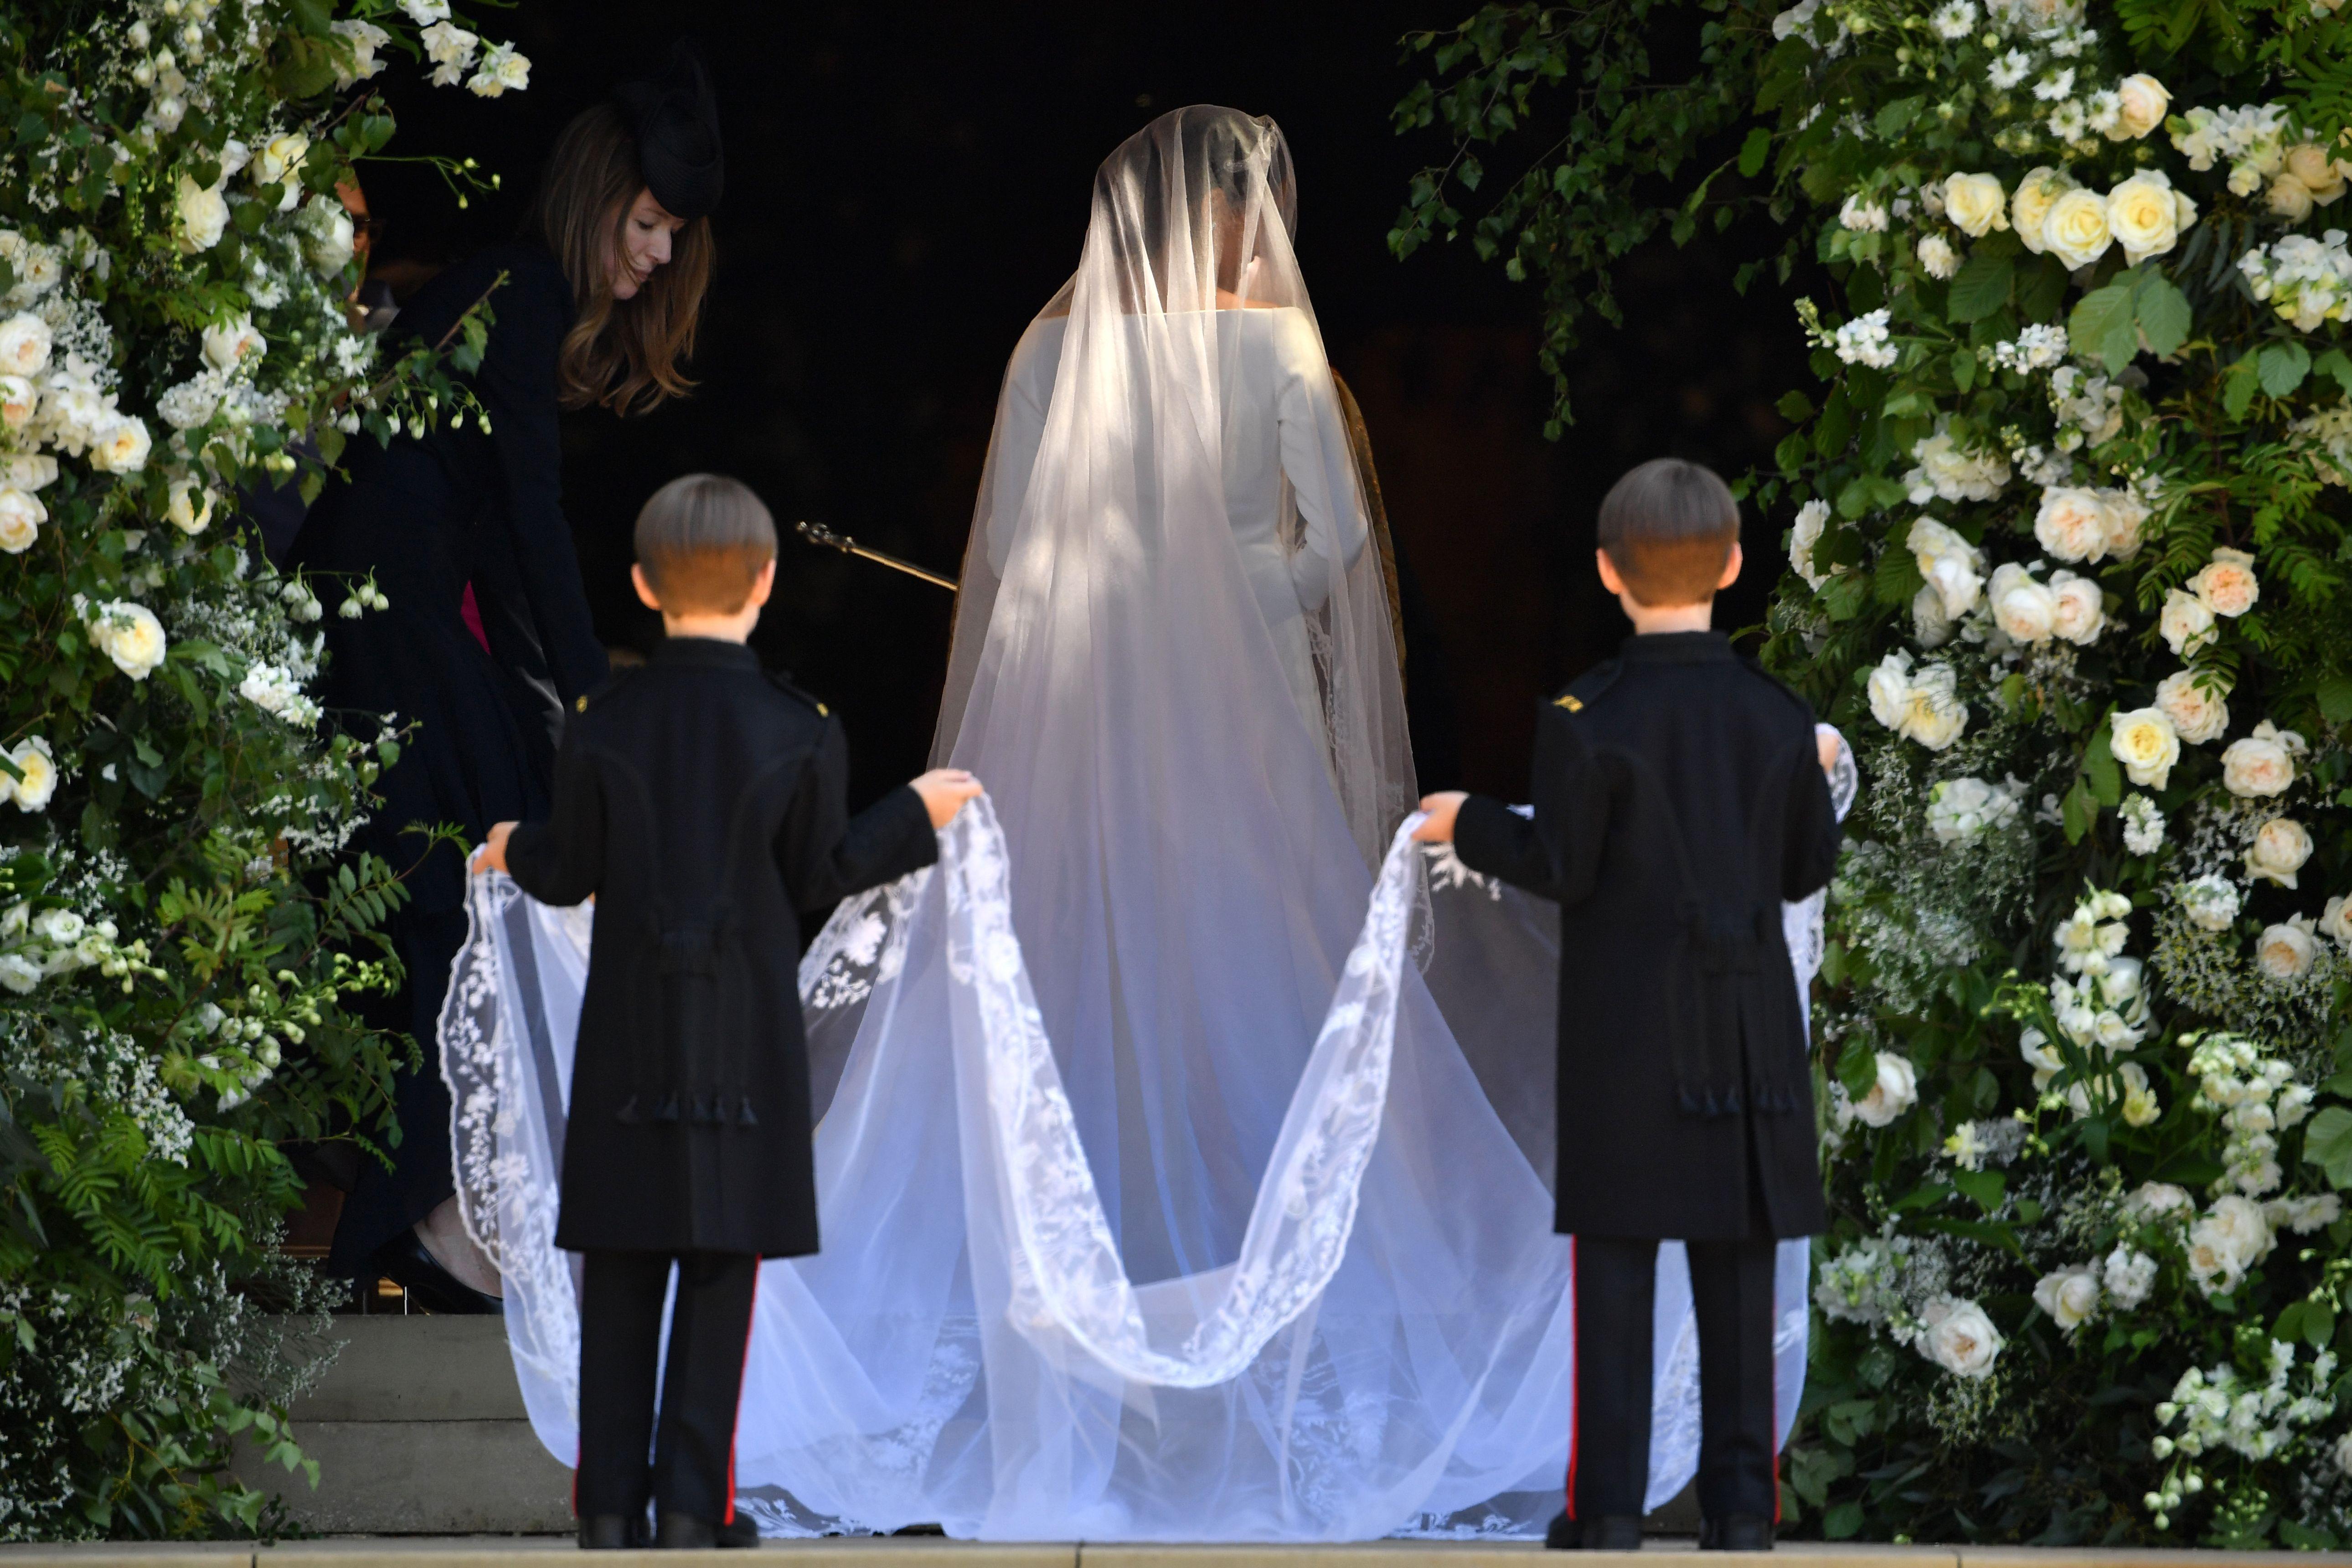 Meghan Markle arrives for her wedding